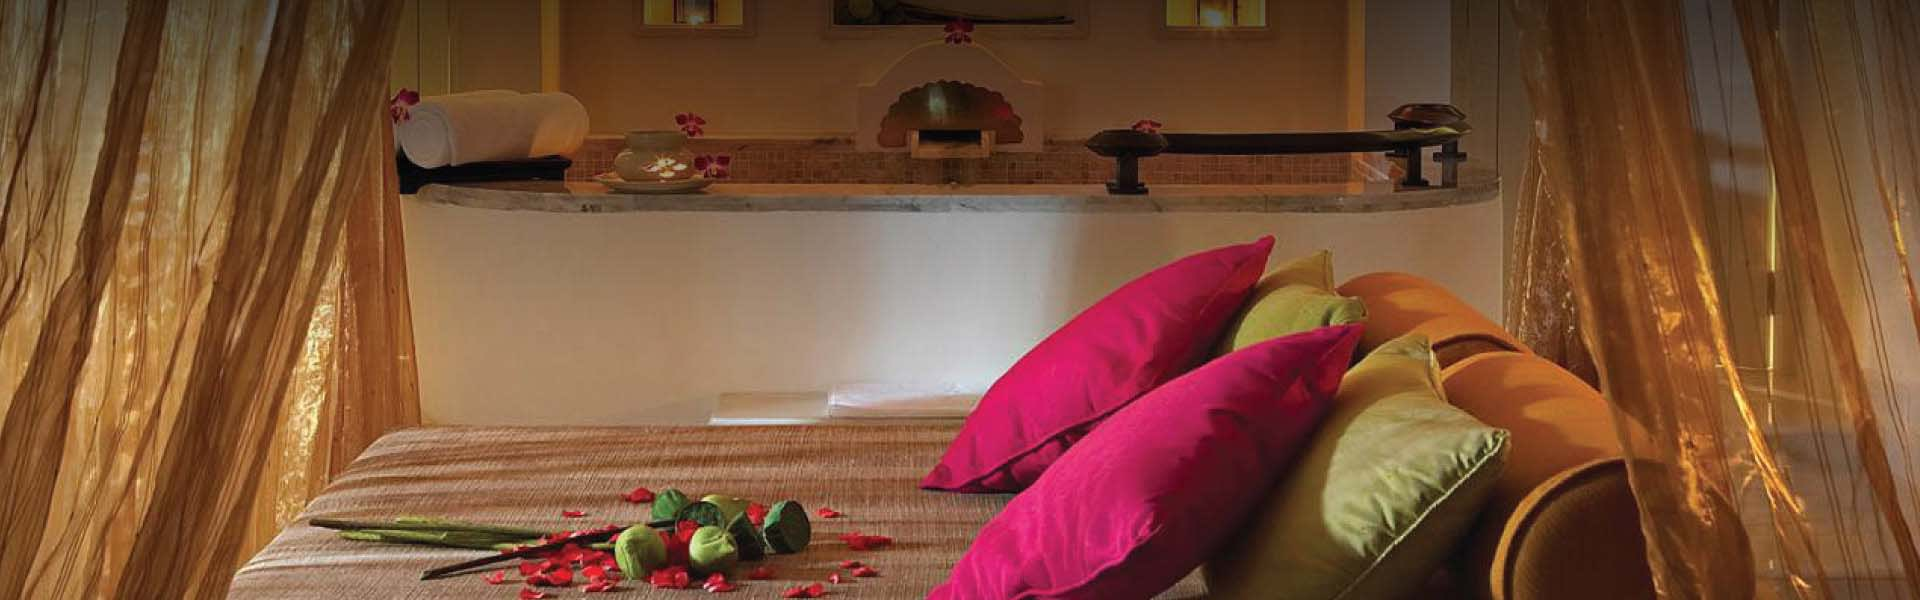 Erotic thai massage janne formoe nakenbilder